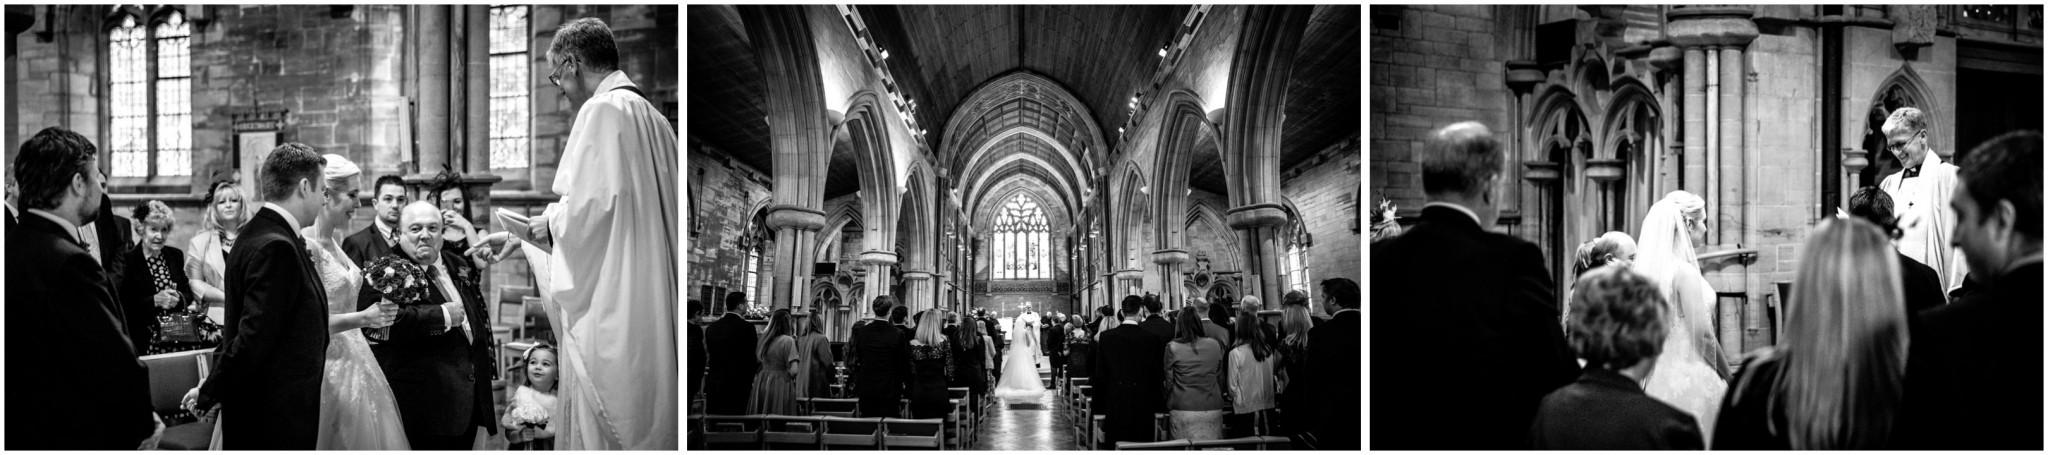 St Saviours Church Brockenhurst Wedding Ceremony